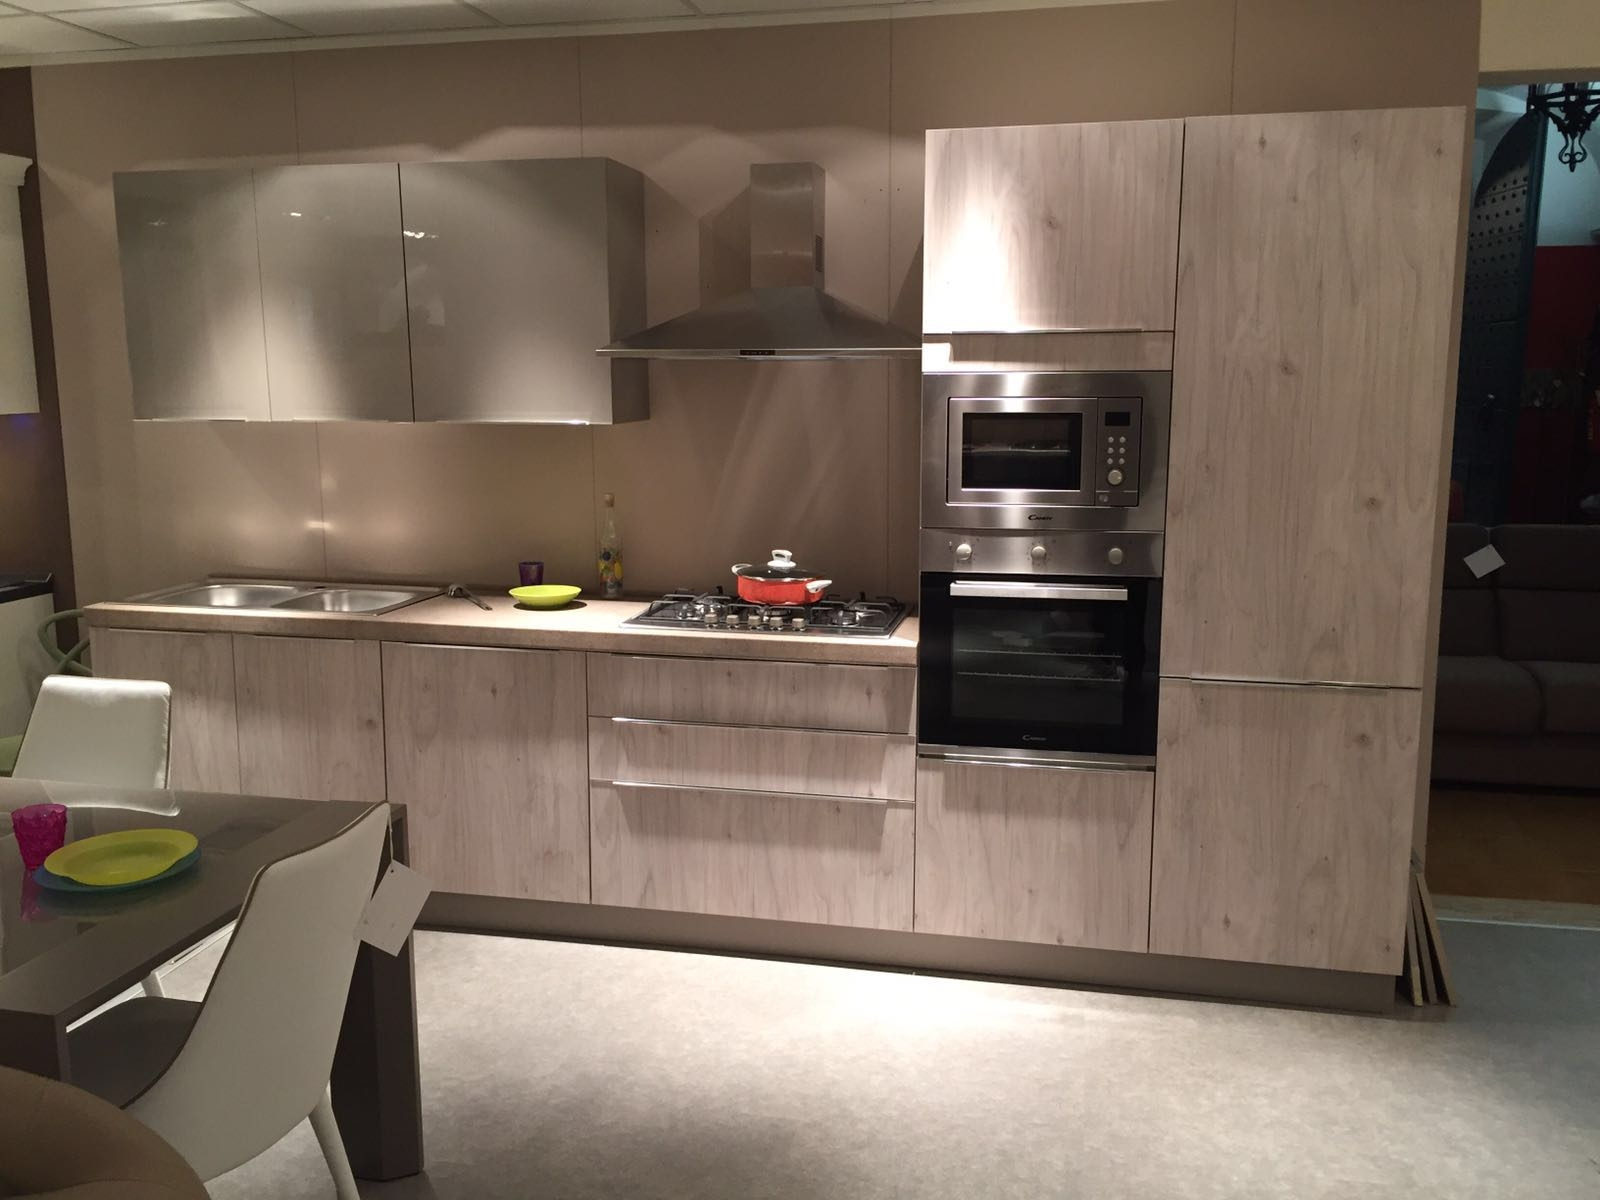 Netcucine cucina moderna lineare con elettrodomestici - Cucina a mobile ...